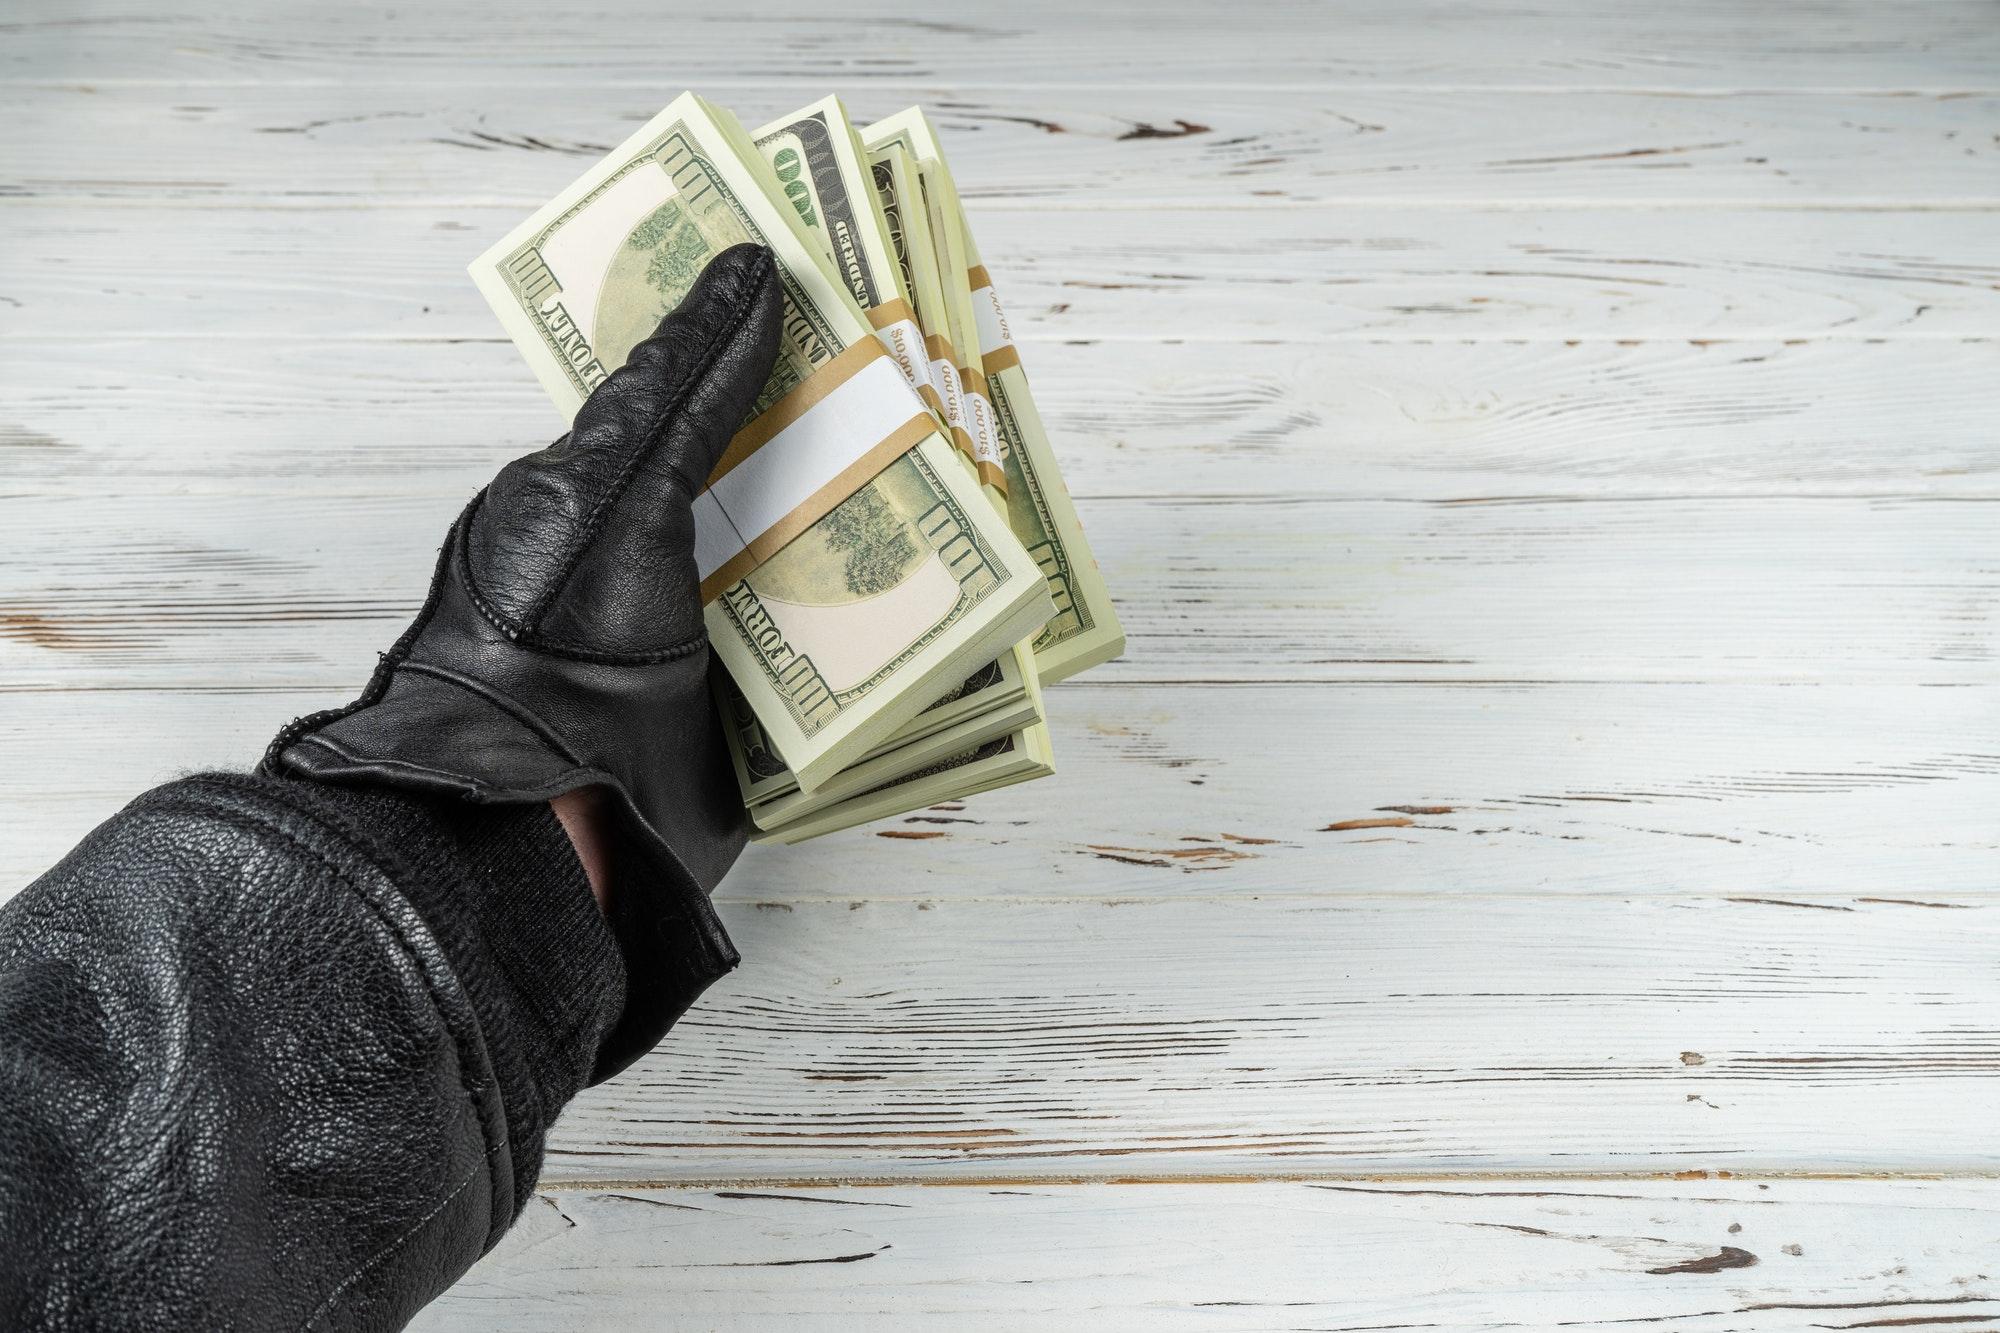 Man In Black Leather Gloves Holding Bricks Of Money